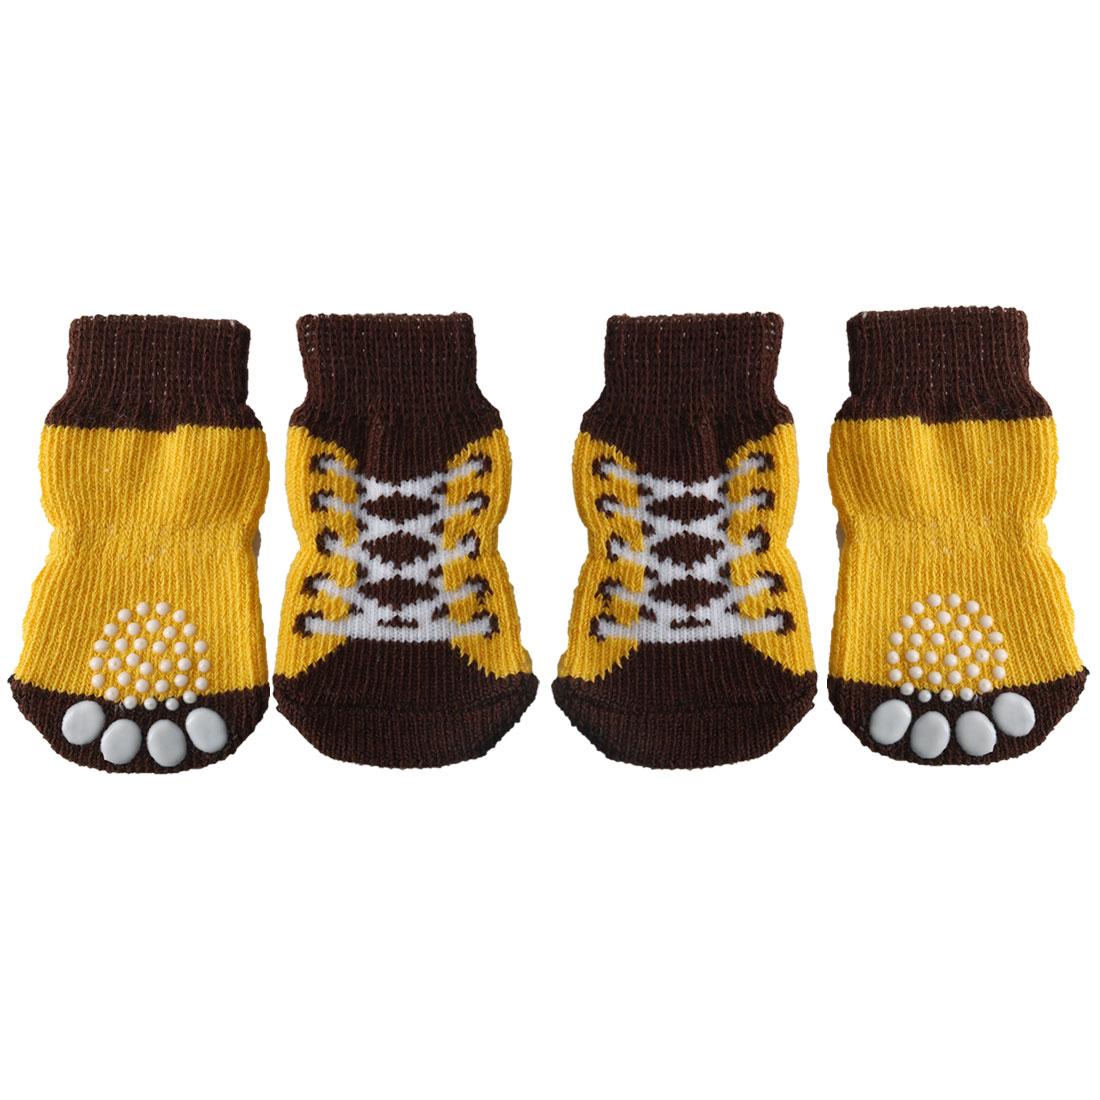 4 PCS Puppy Dog Cat Socks Warm Anti-Slip Knit Paw Protector Brown + Yellow, M